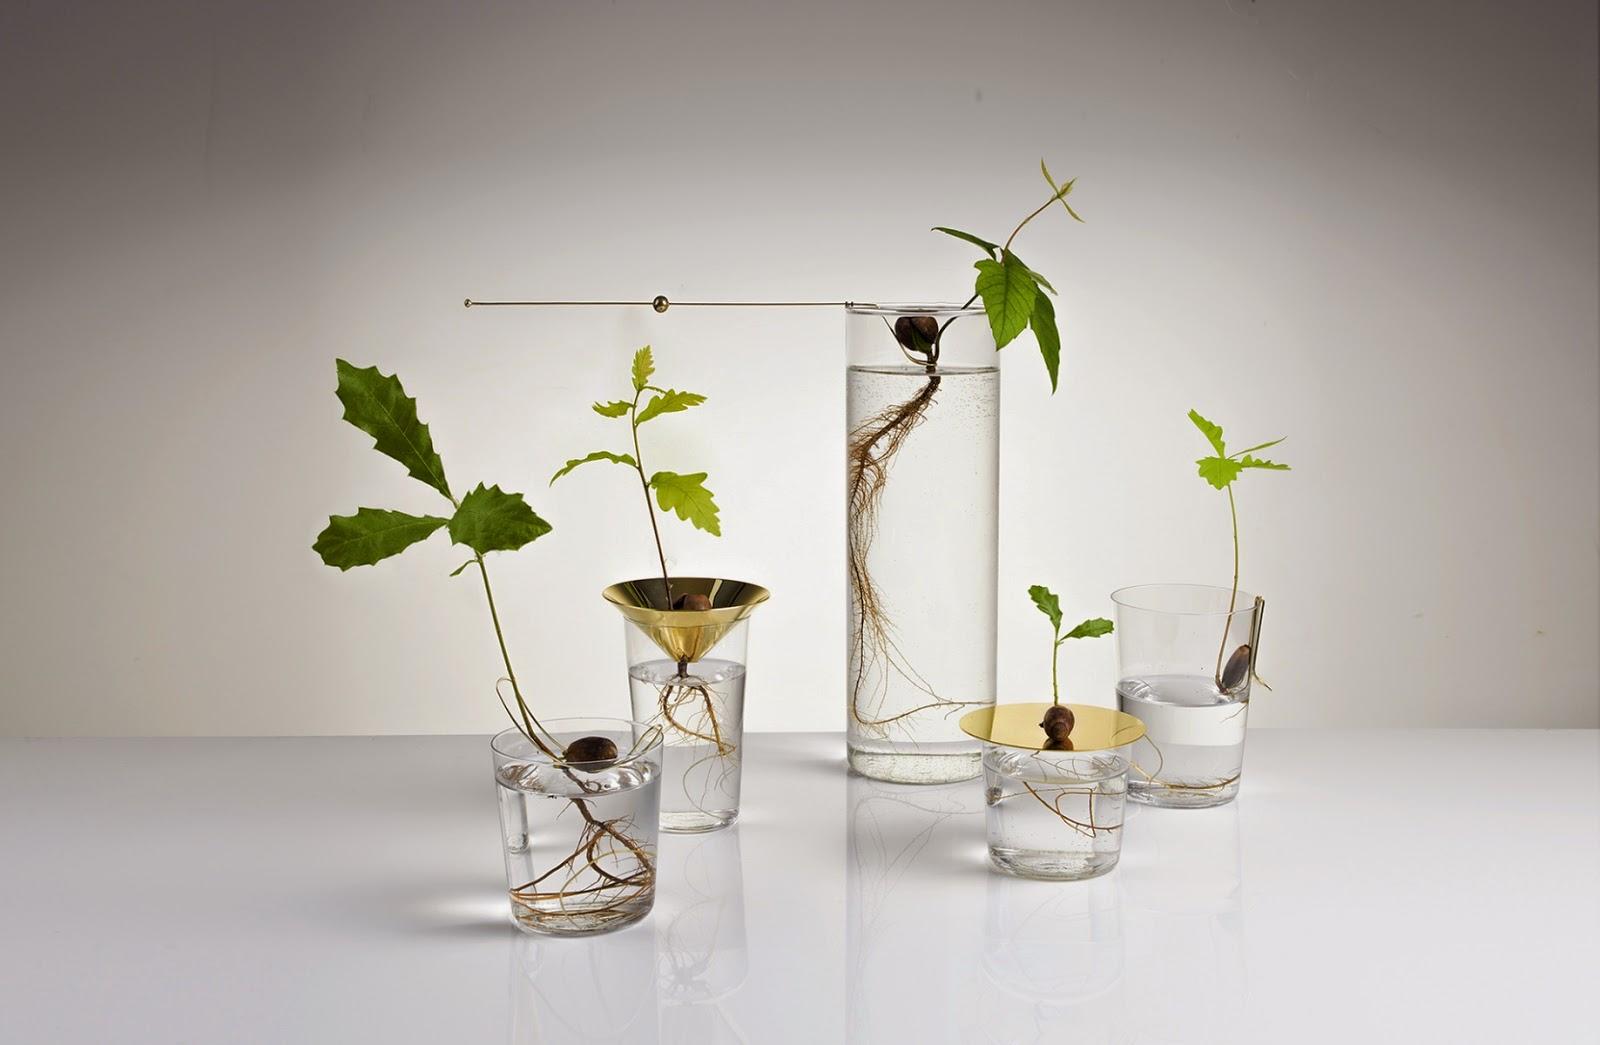 Jardins minimalistas larissa carbone arquitetura for Plantas minimalistas